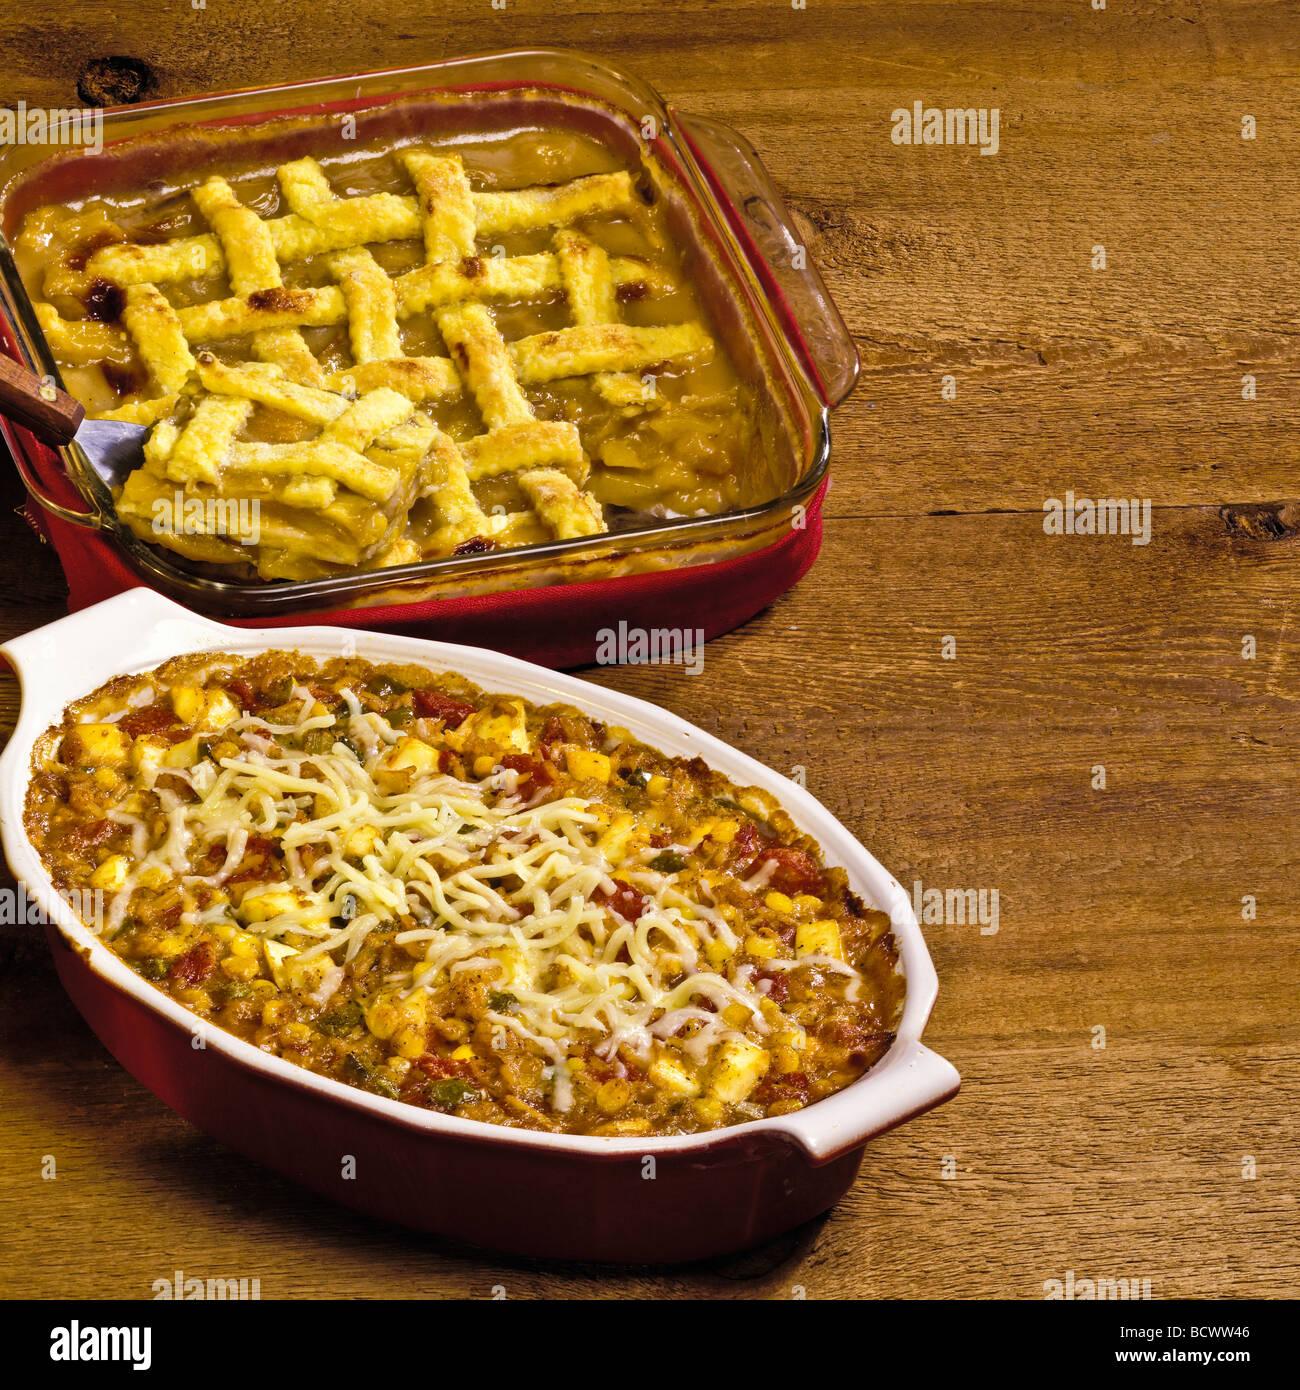 Country Kitchen Recipes Y Corn Casserole Peach Cobbler Supreme Dessert Cheddar Cheese Tomatoes Rice